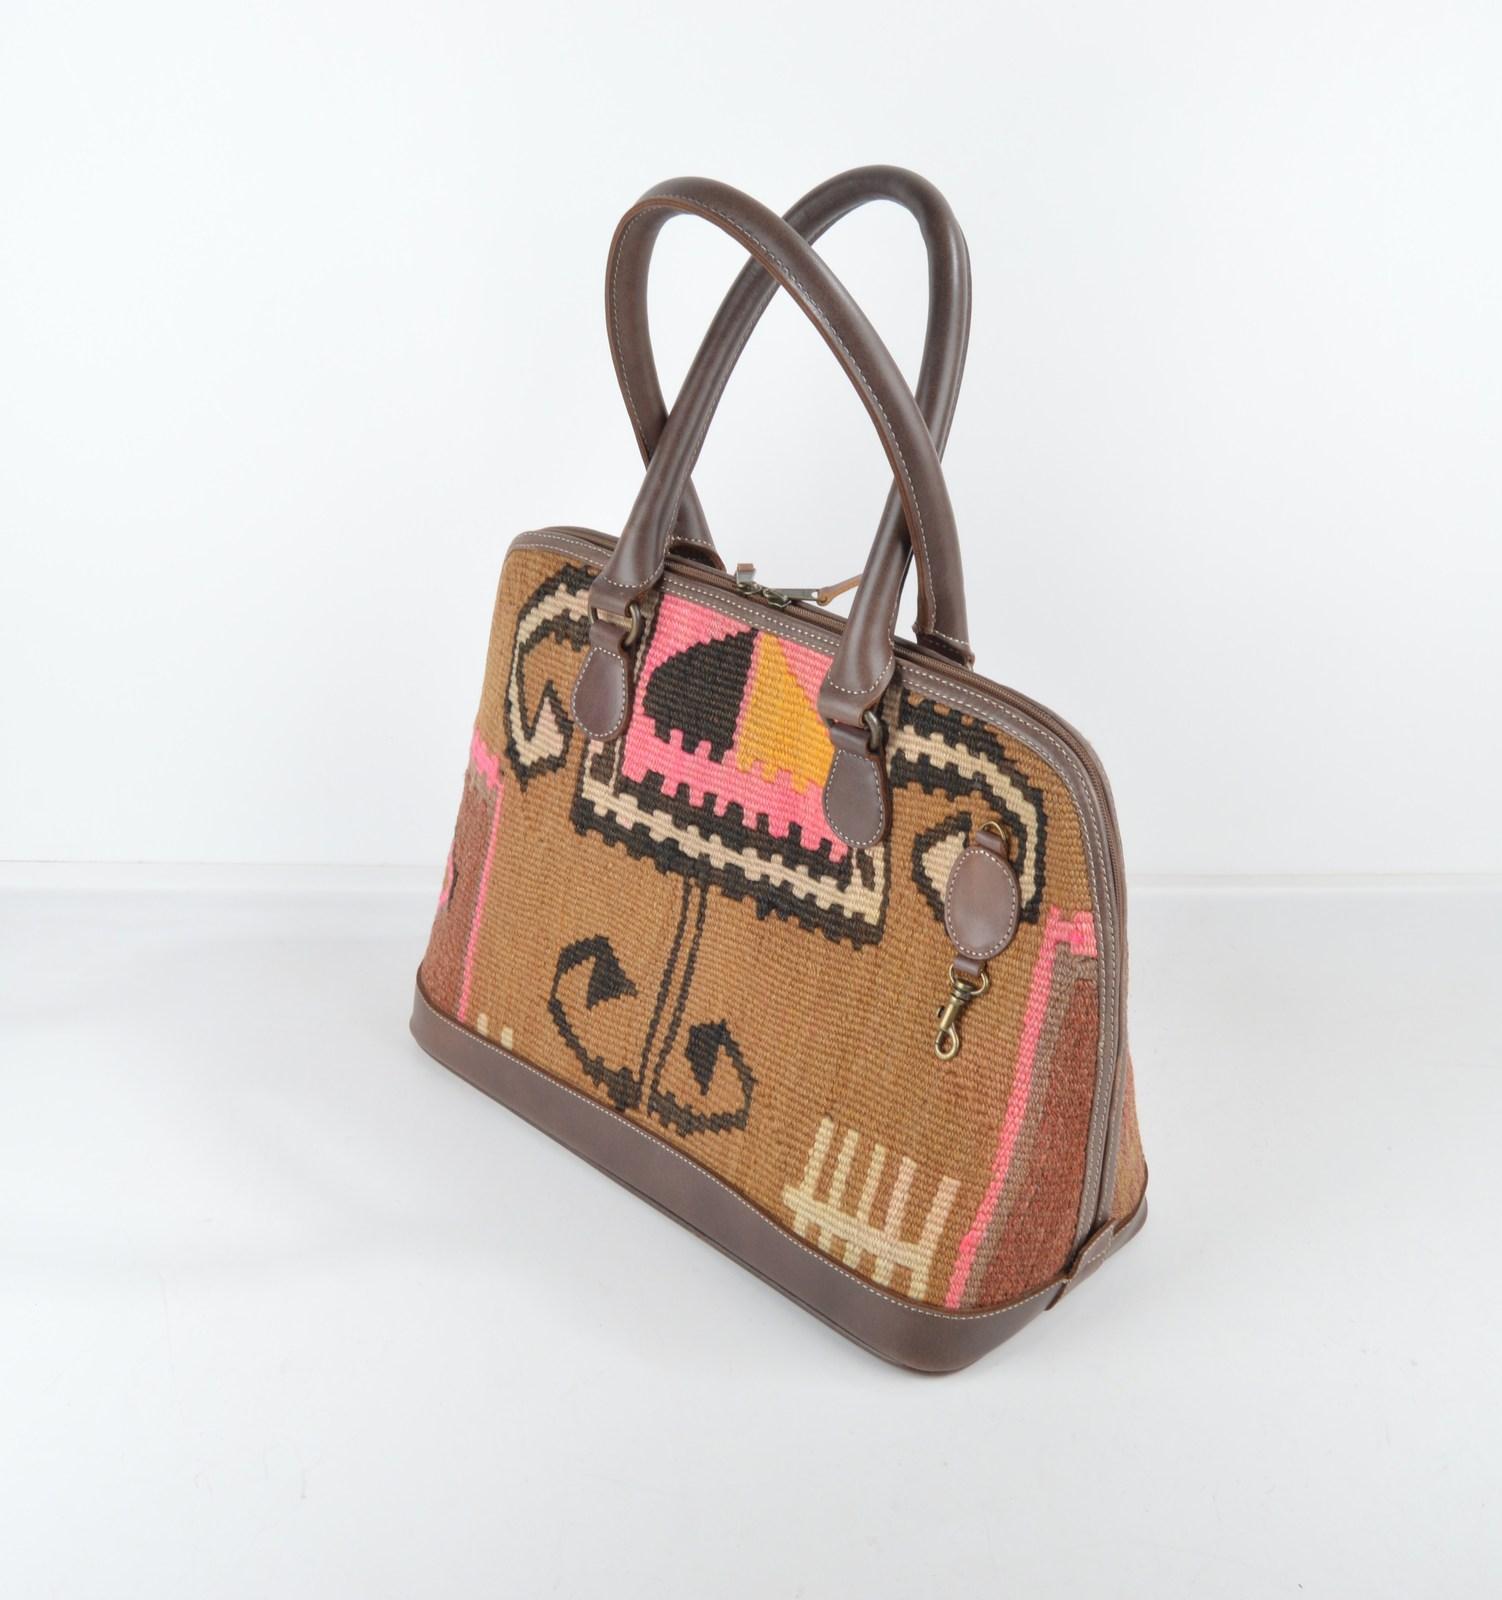 kilim bags,handmade bags,bags and purses,leather bags,wool bag,rug leather bag  - $189.00